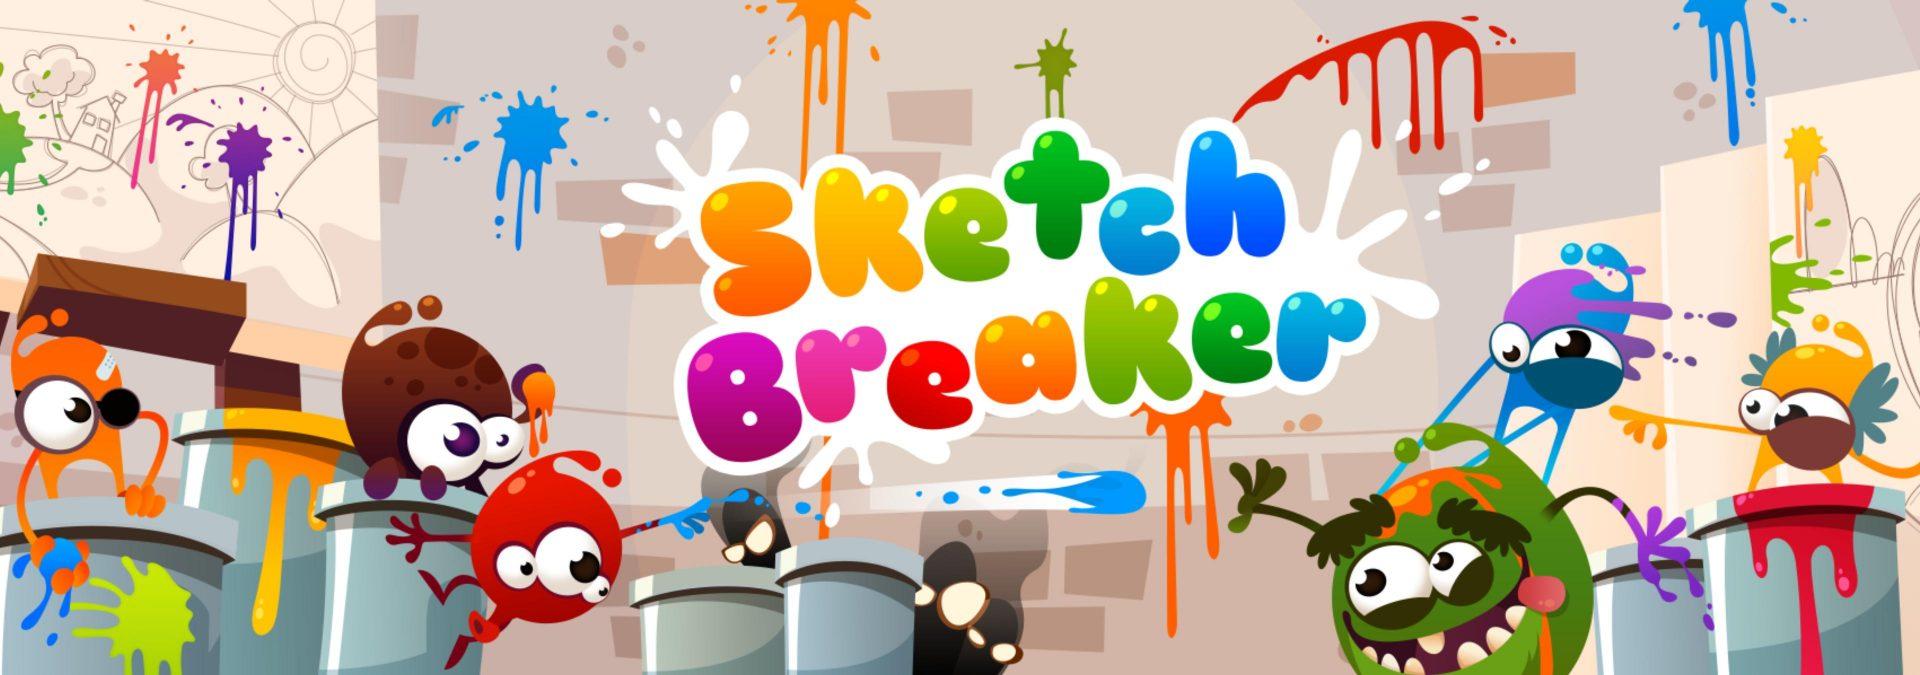 Sketch Breaker